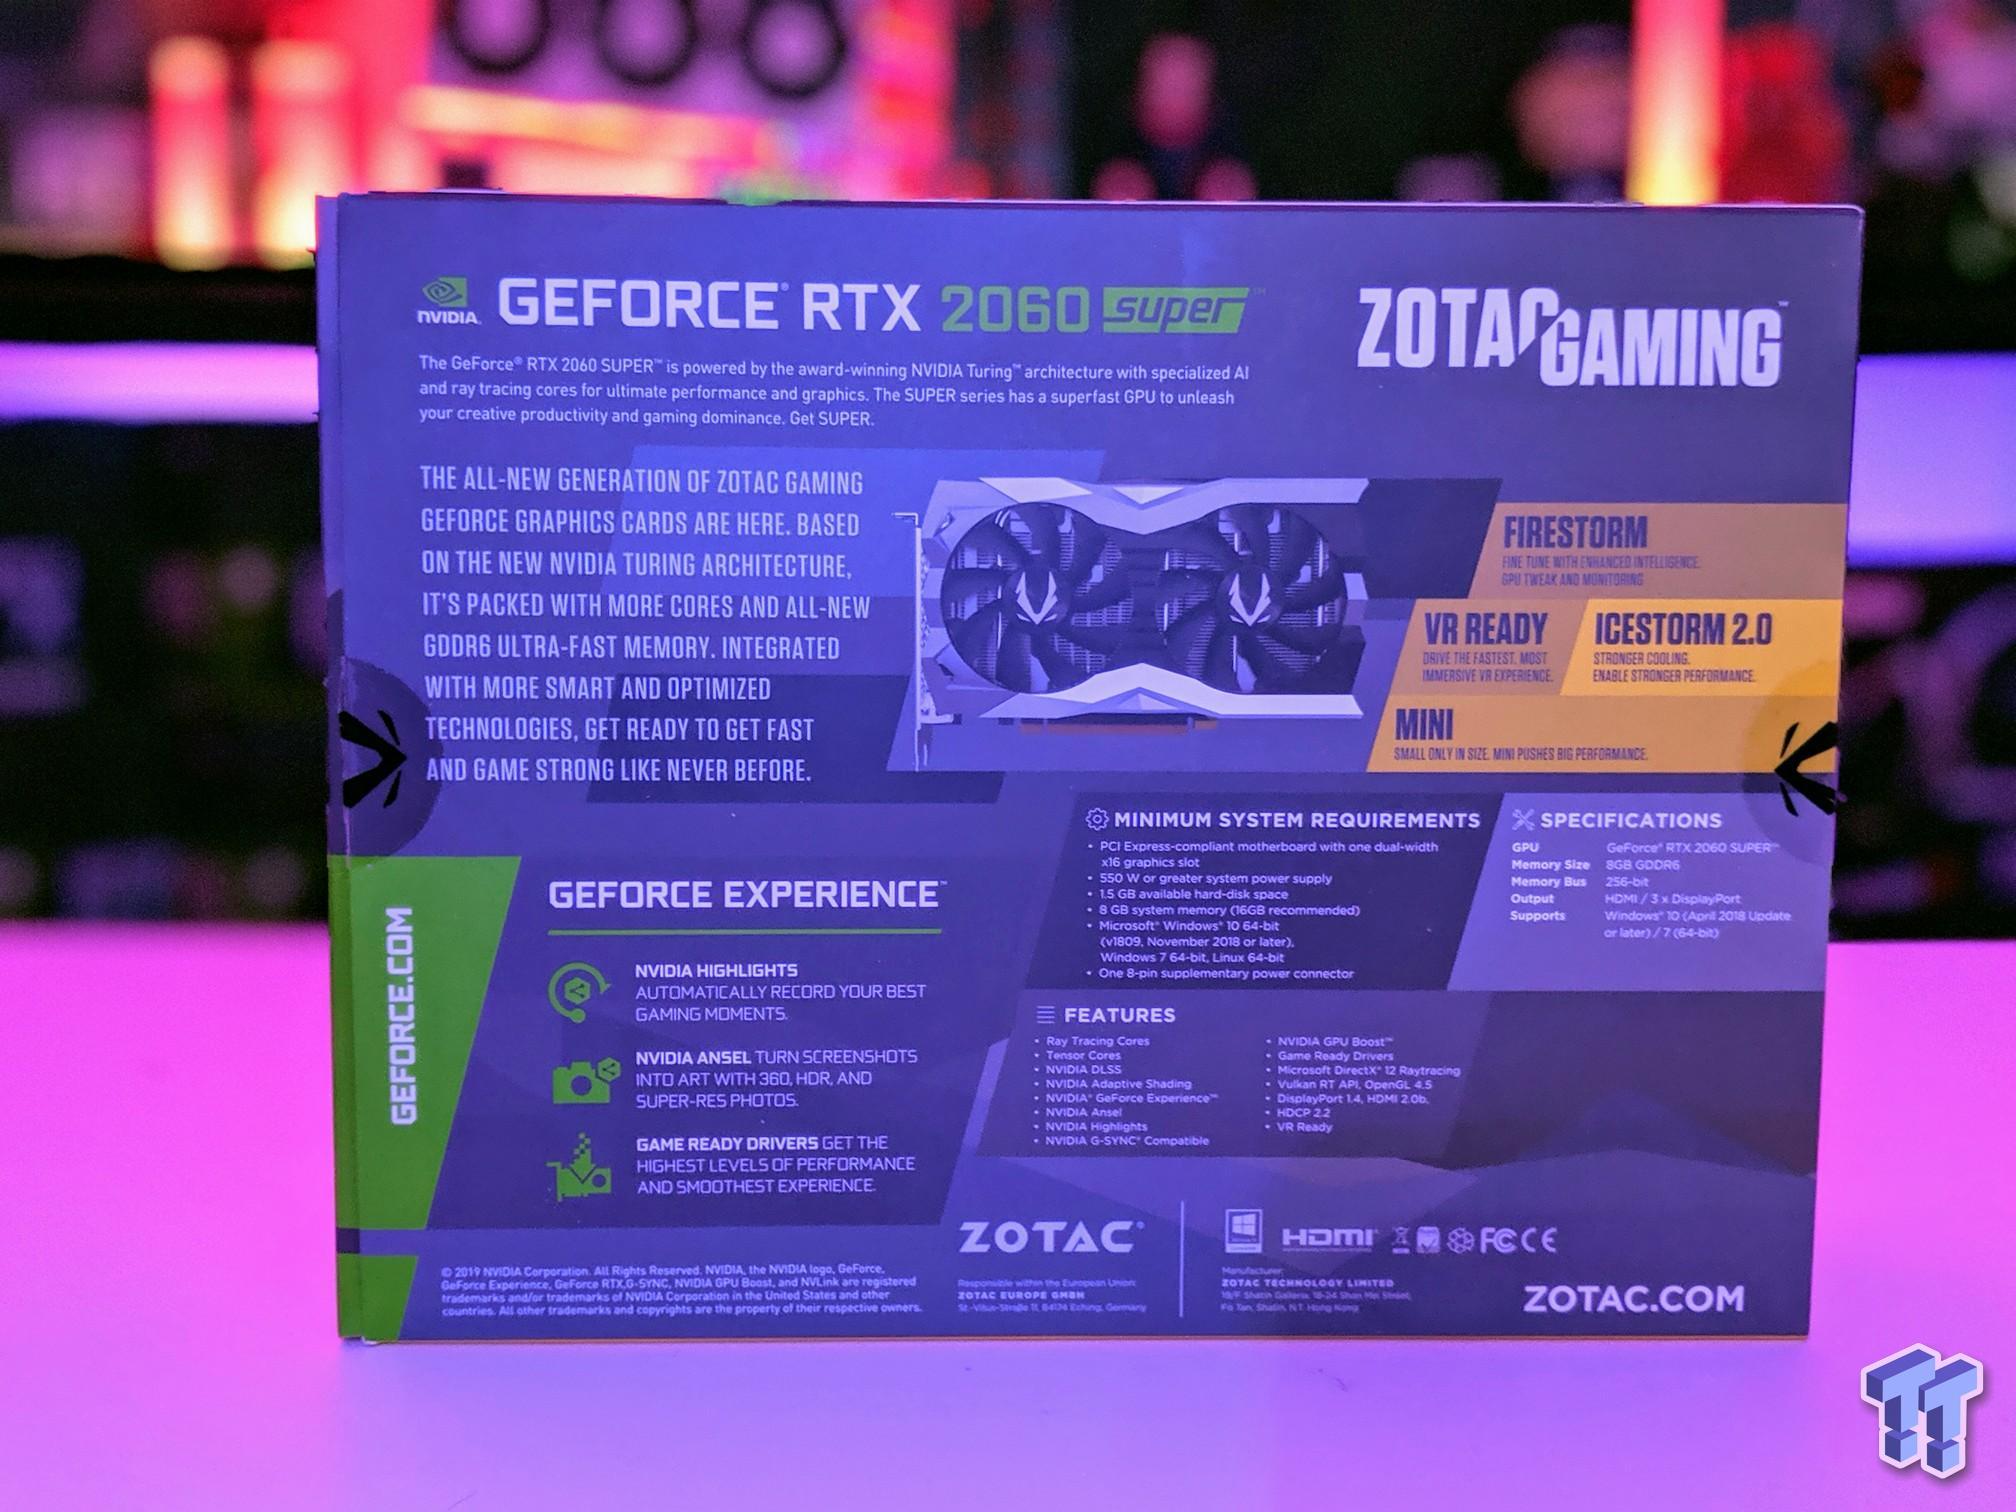 ZOTAC GeForce RTX 2060 SUPER MINI: Small, Yet Crazy Powerful